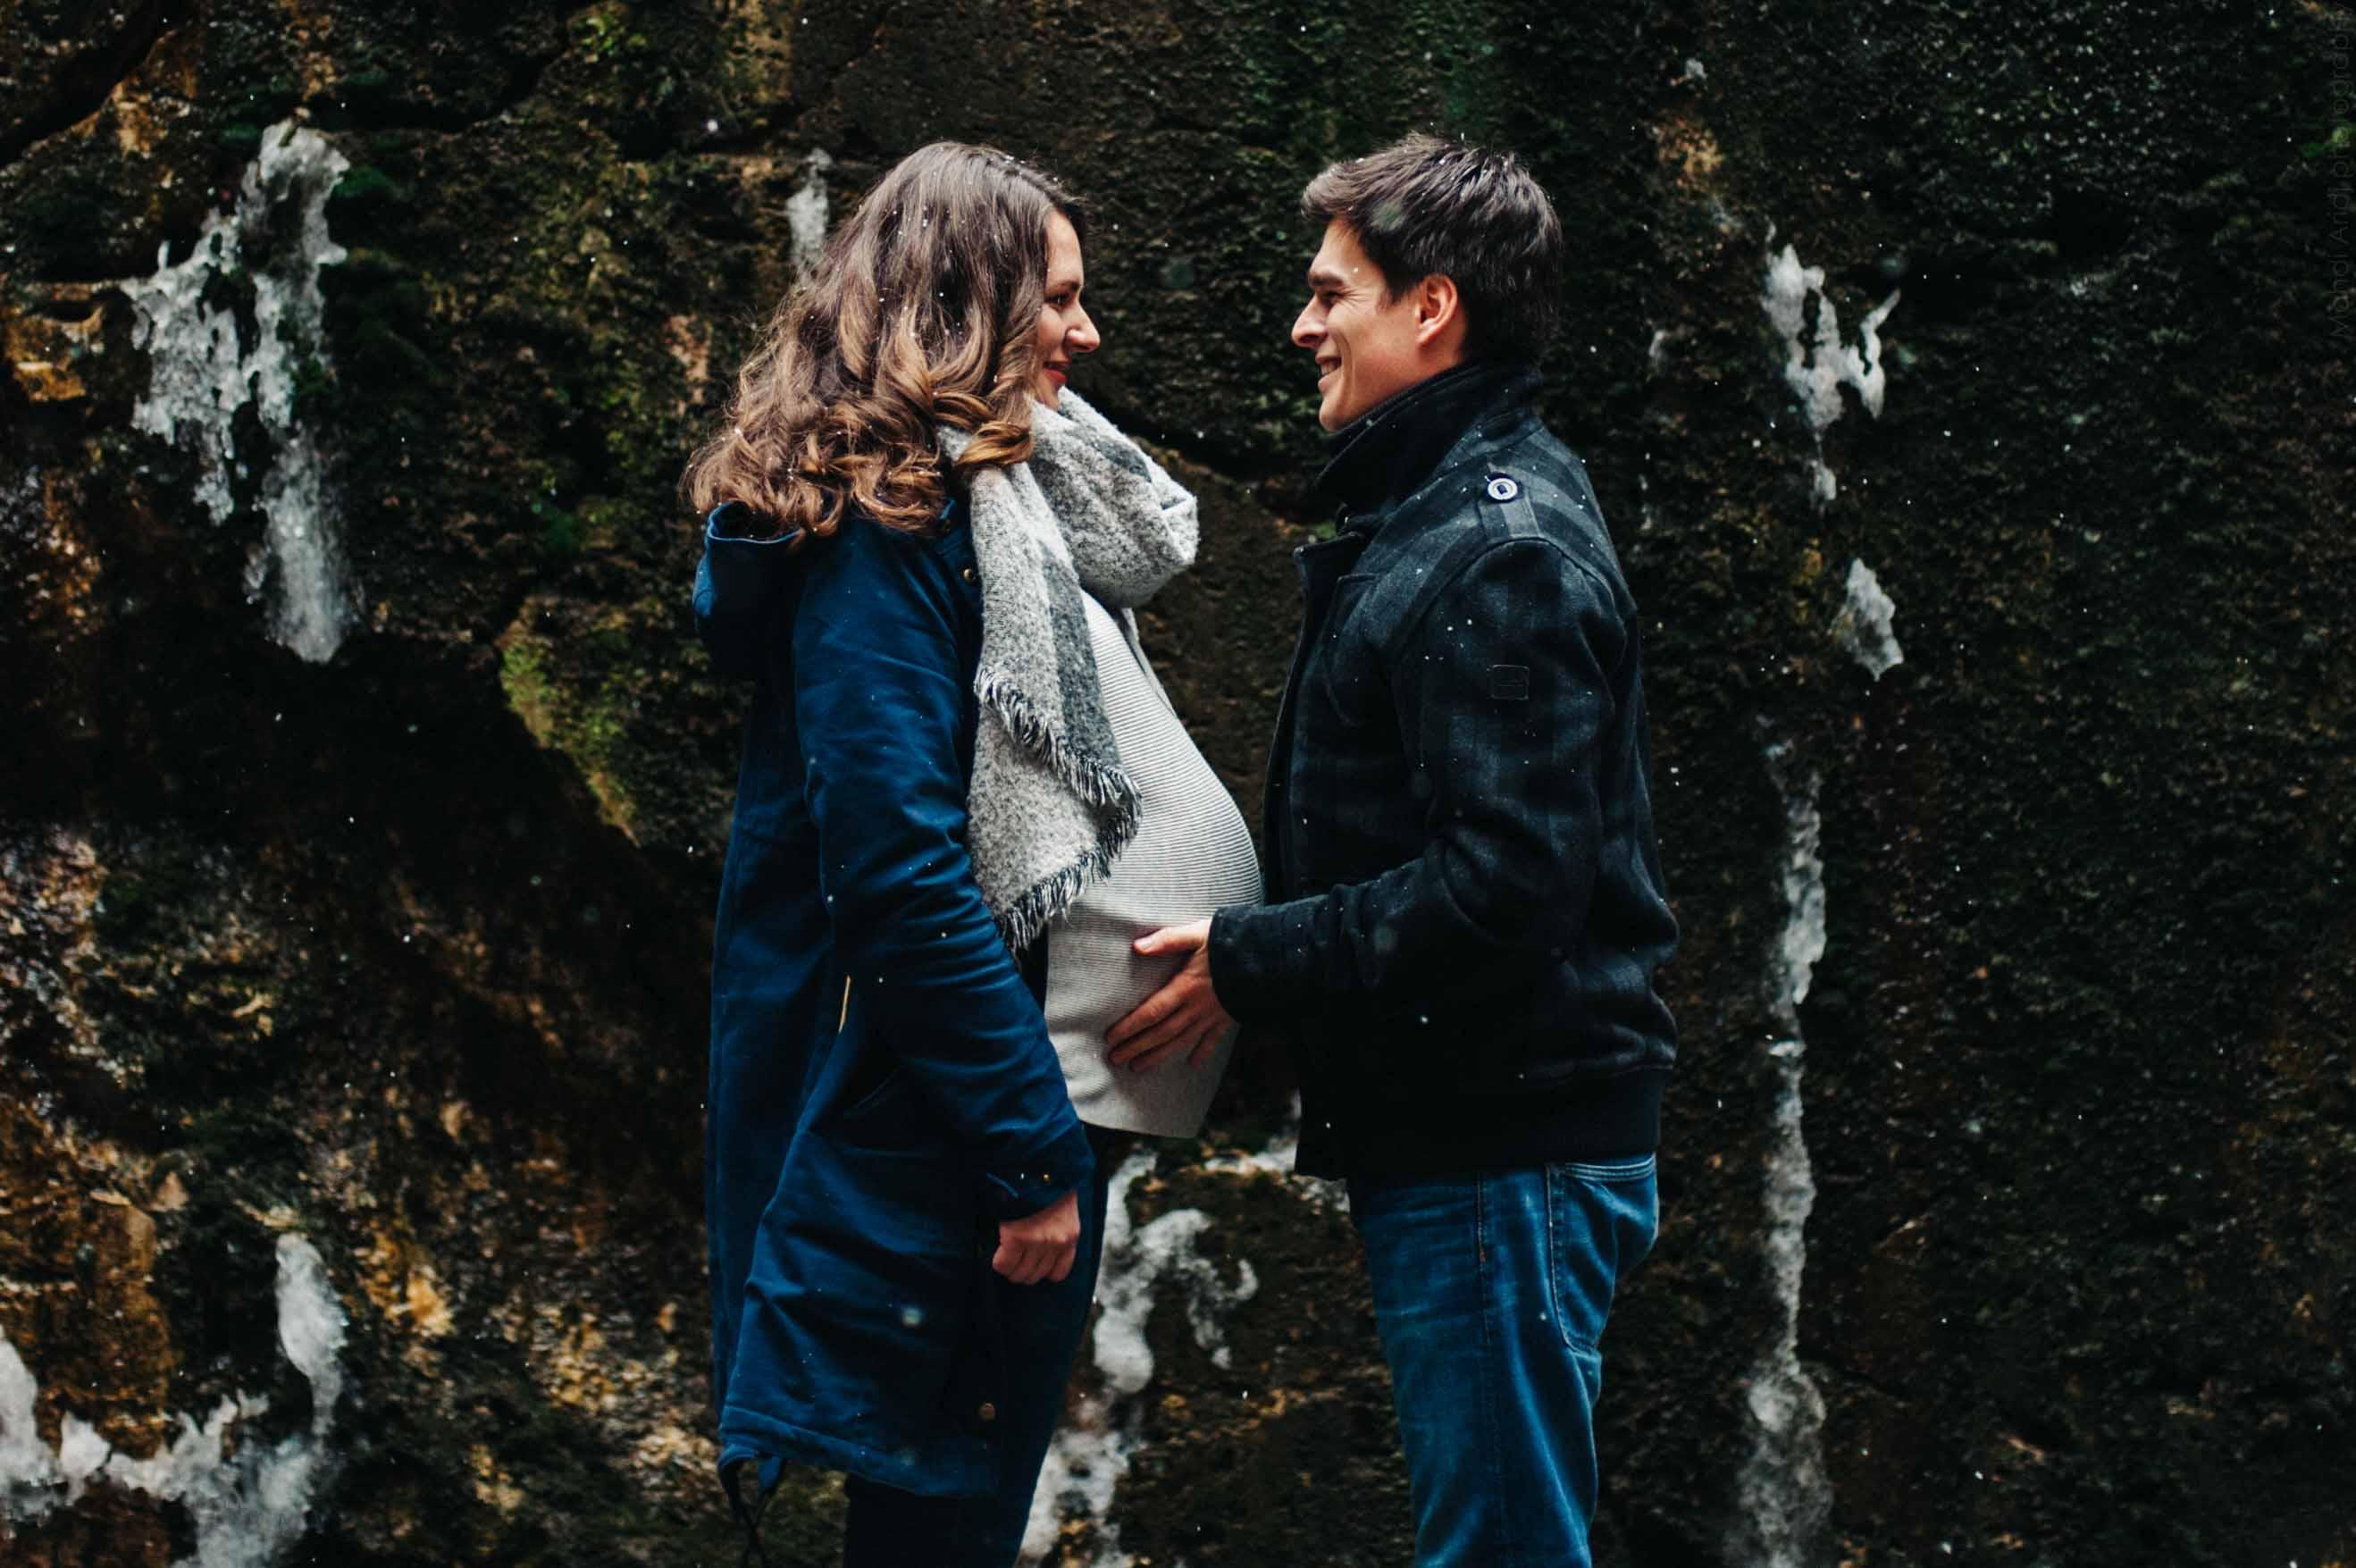 Pregnancy photography in Berlin - Photographe de grossesse à Berlin